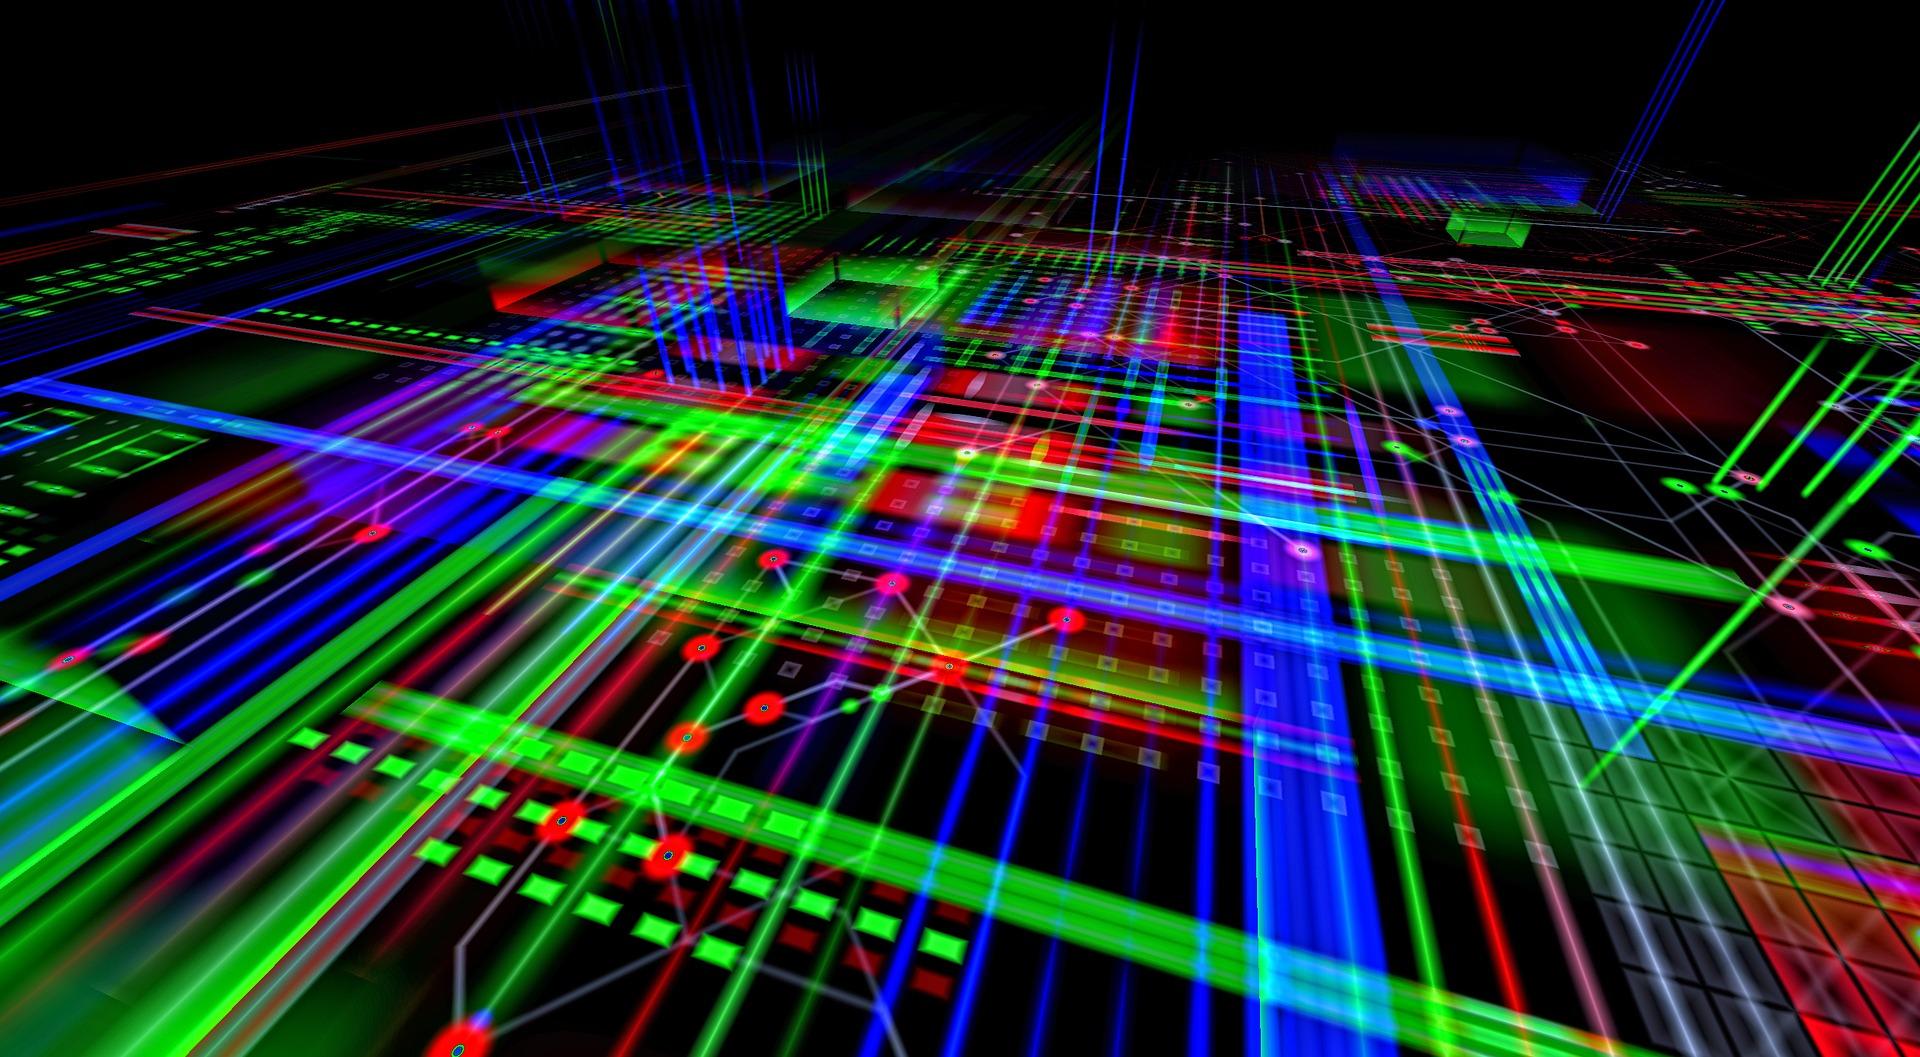 electronics-1607250_1920.jpg